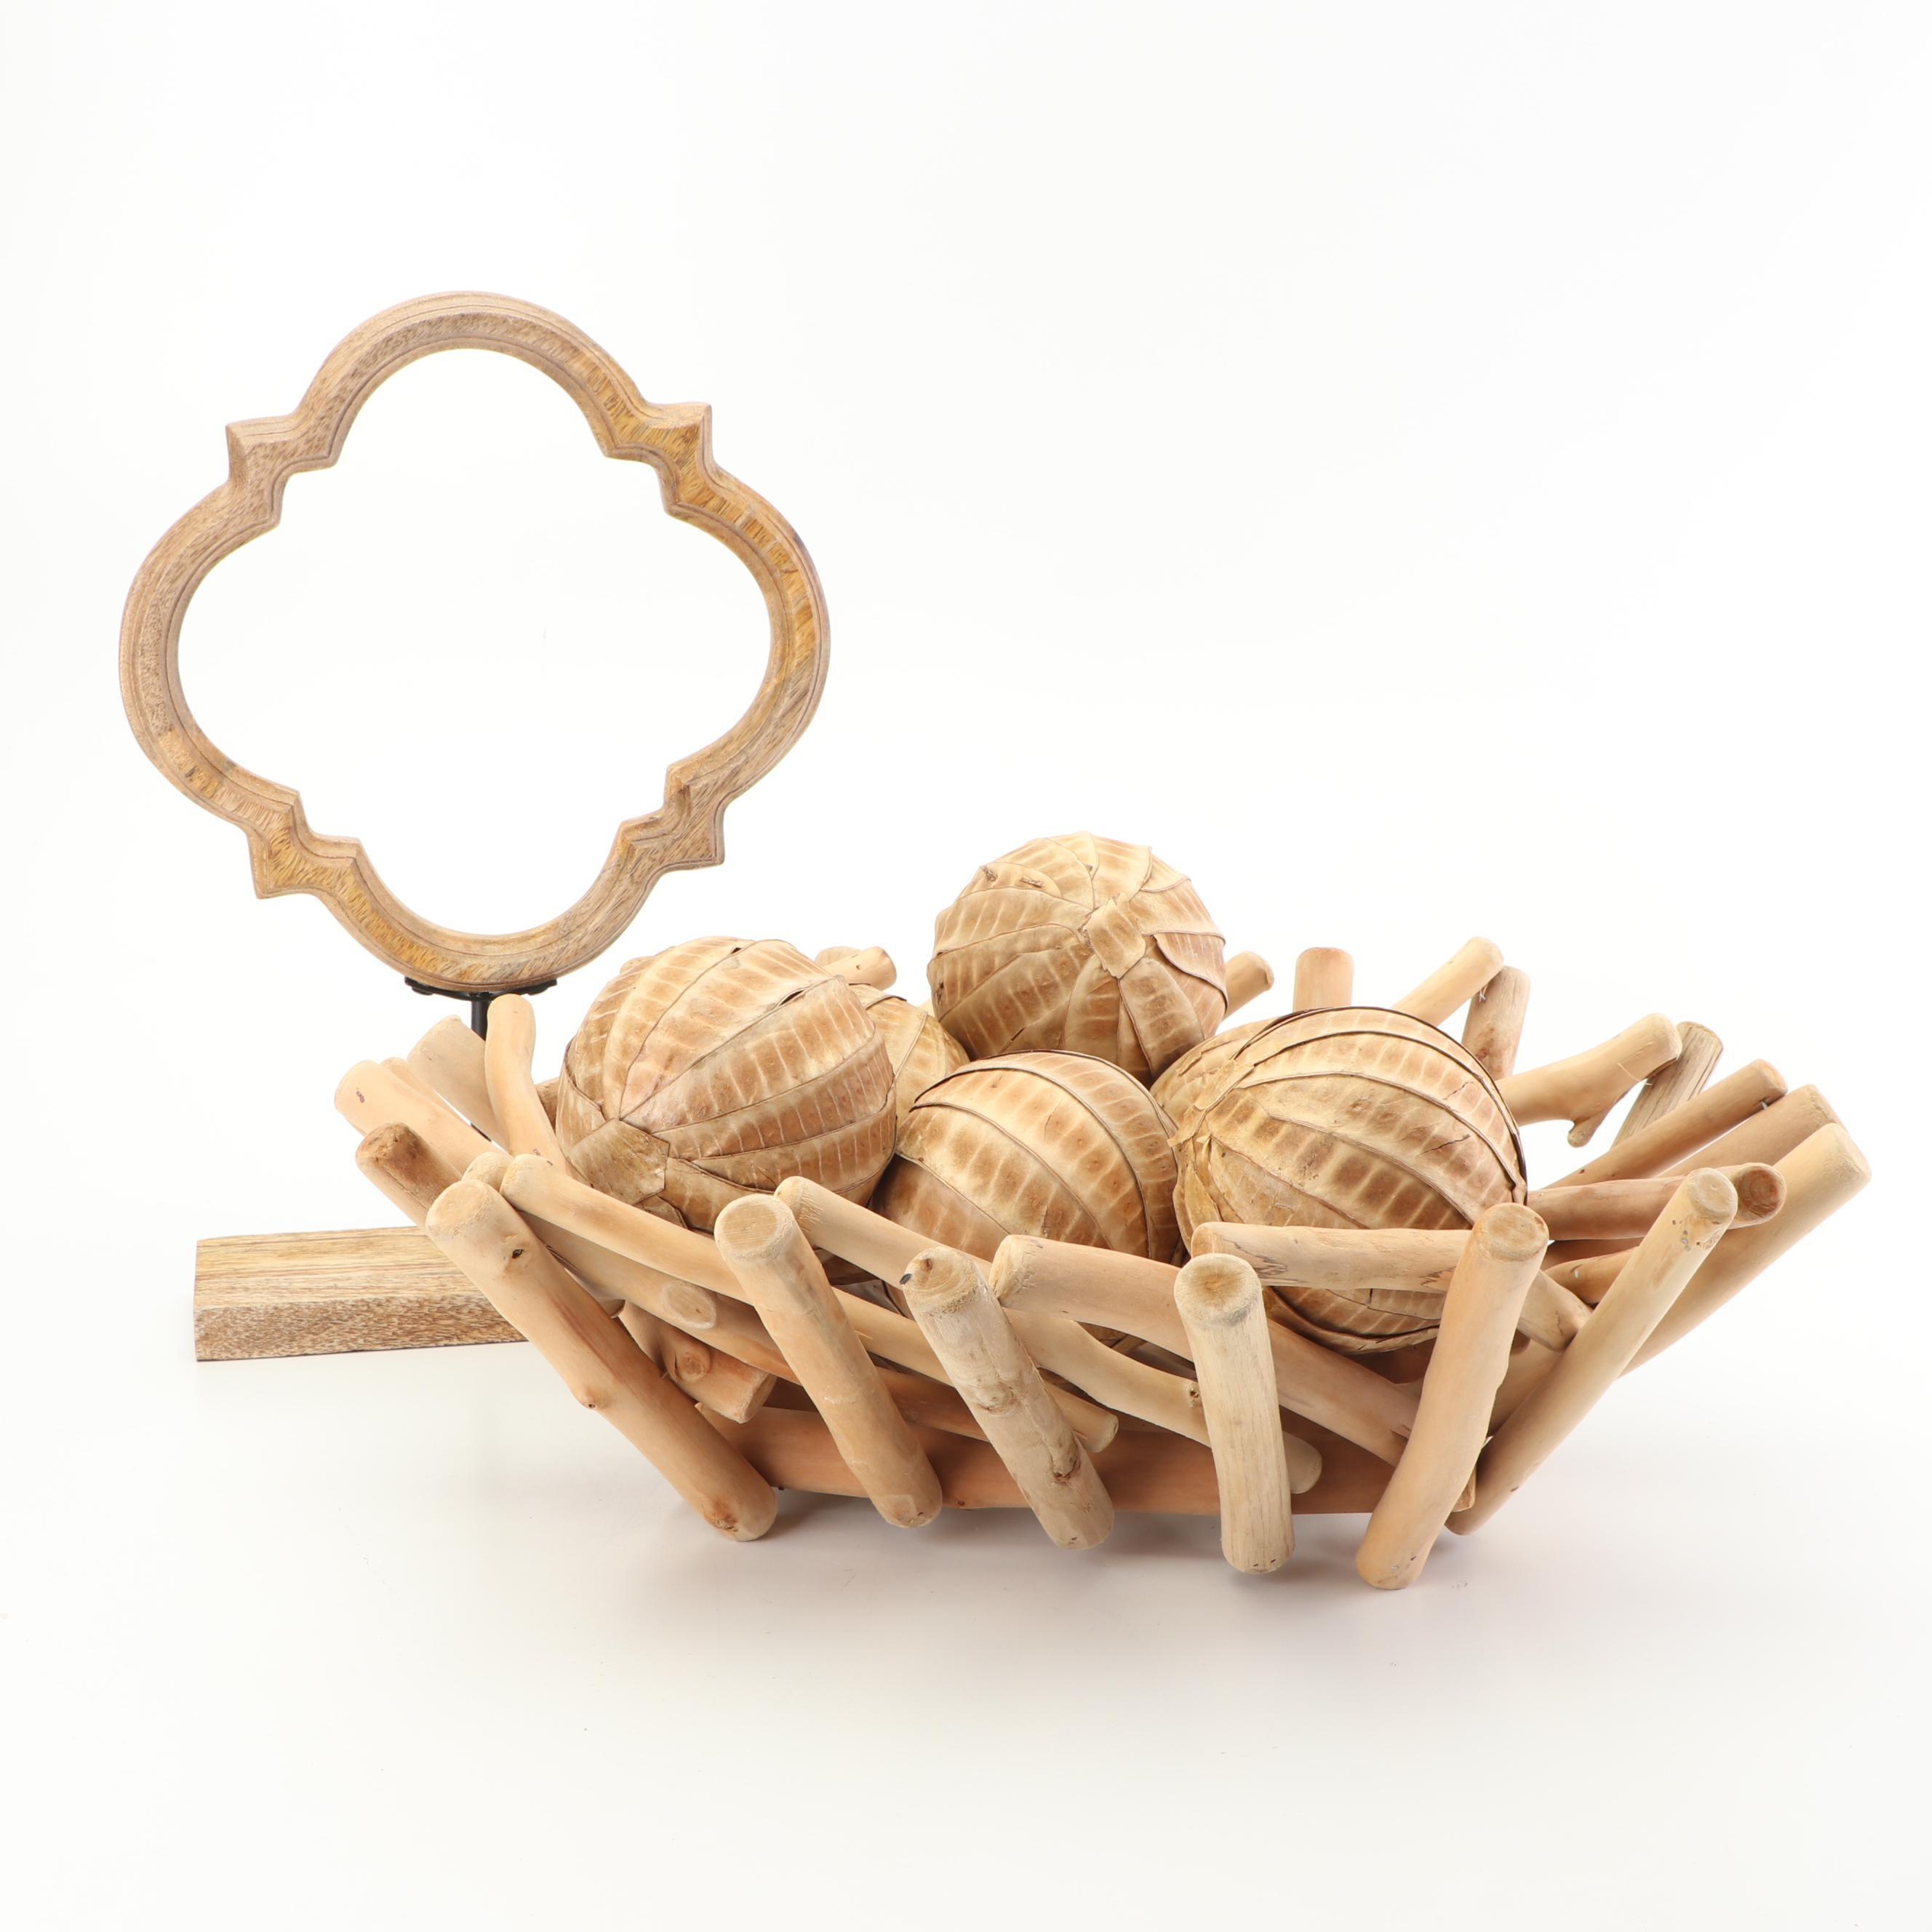 Wooden Home Décor Collection